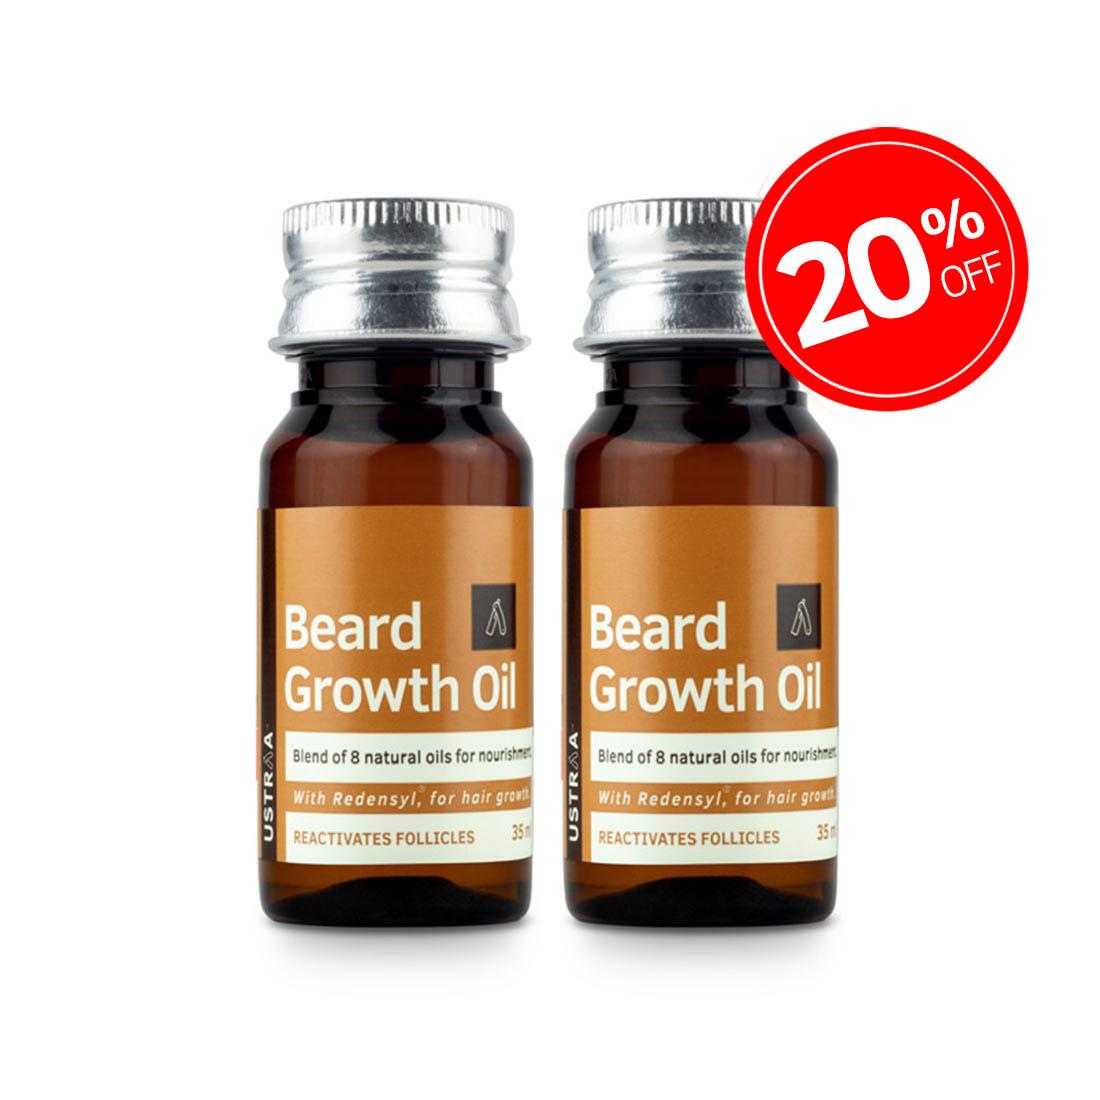 Beard Growth Oil - 35 ml - Set of 2